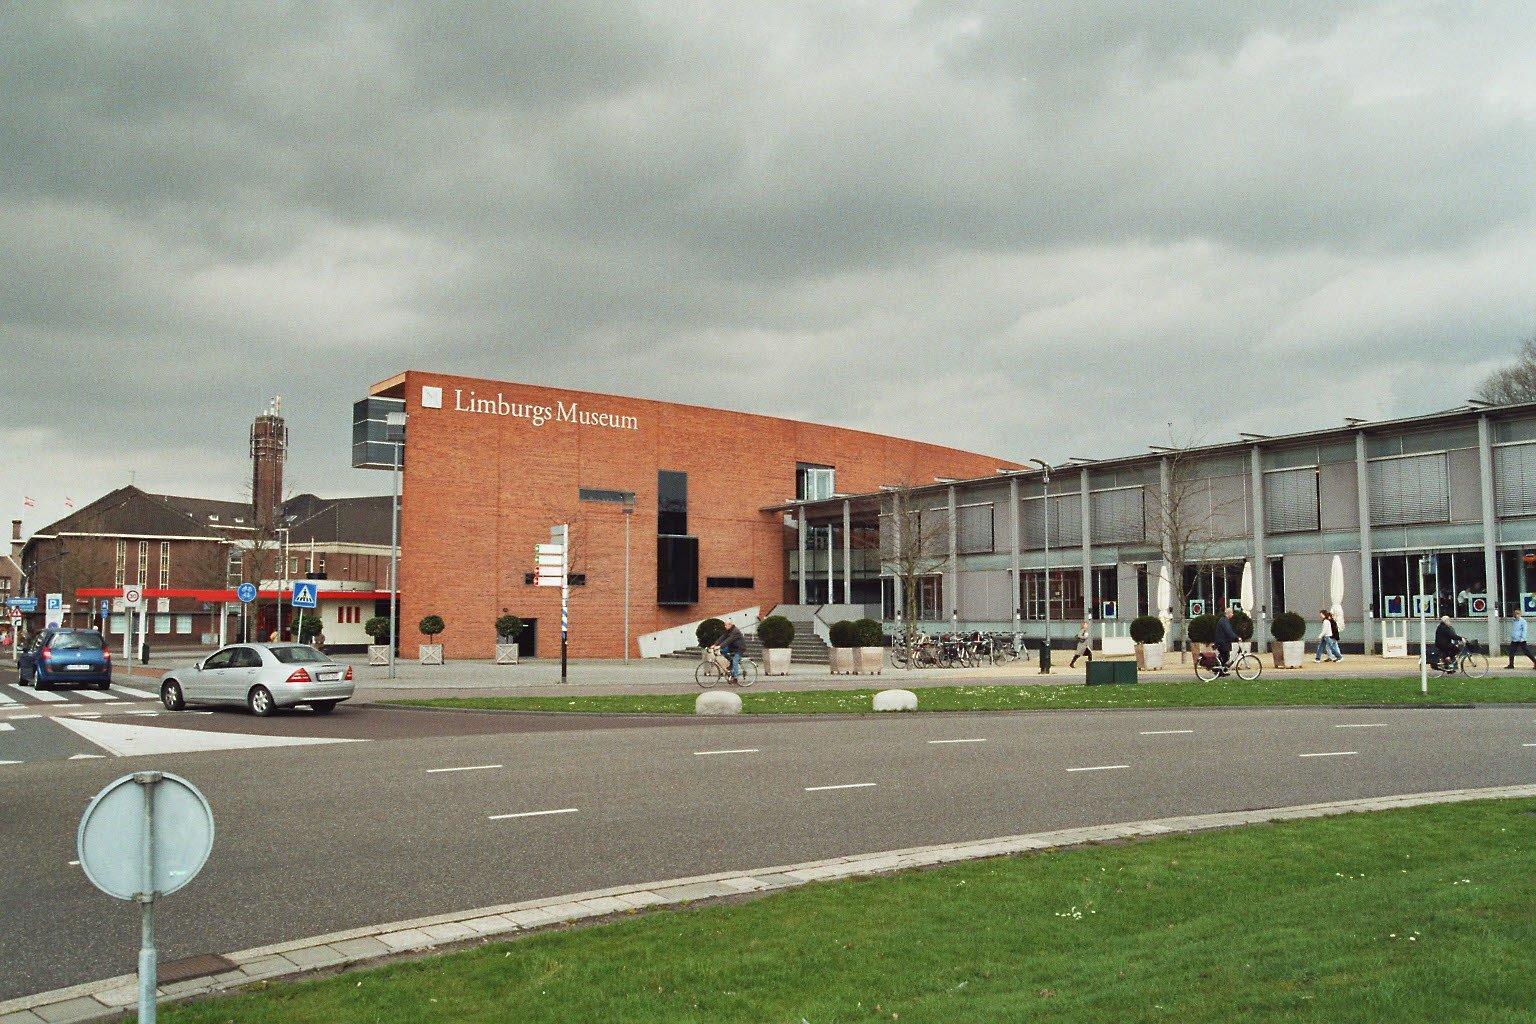 File:Venlo LimburgsMuseum01.jpg - Wikimedia Commons